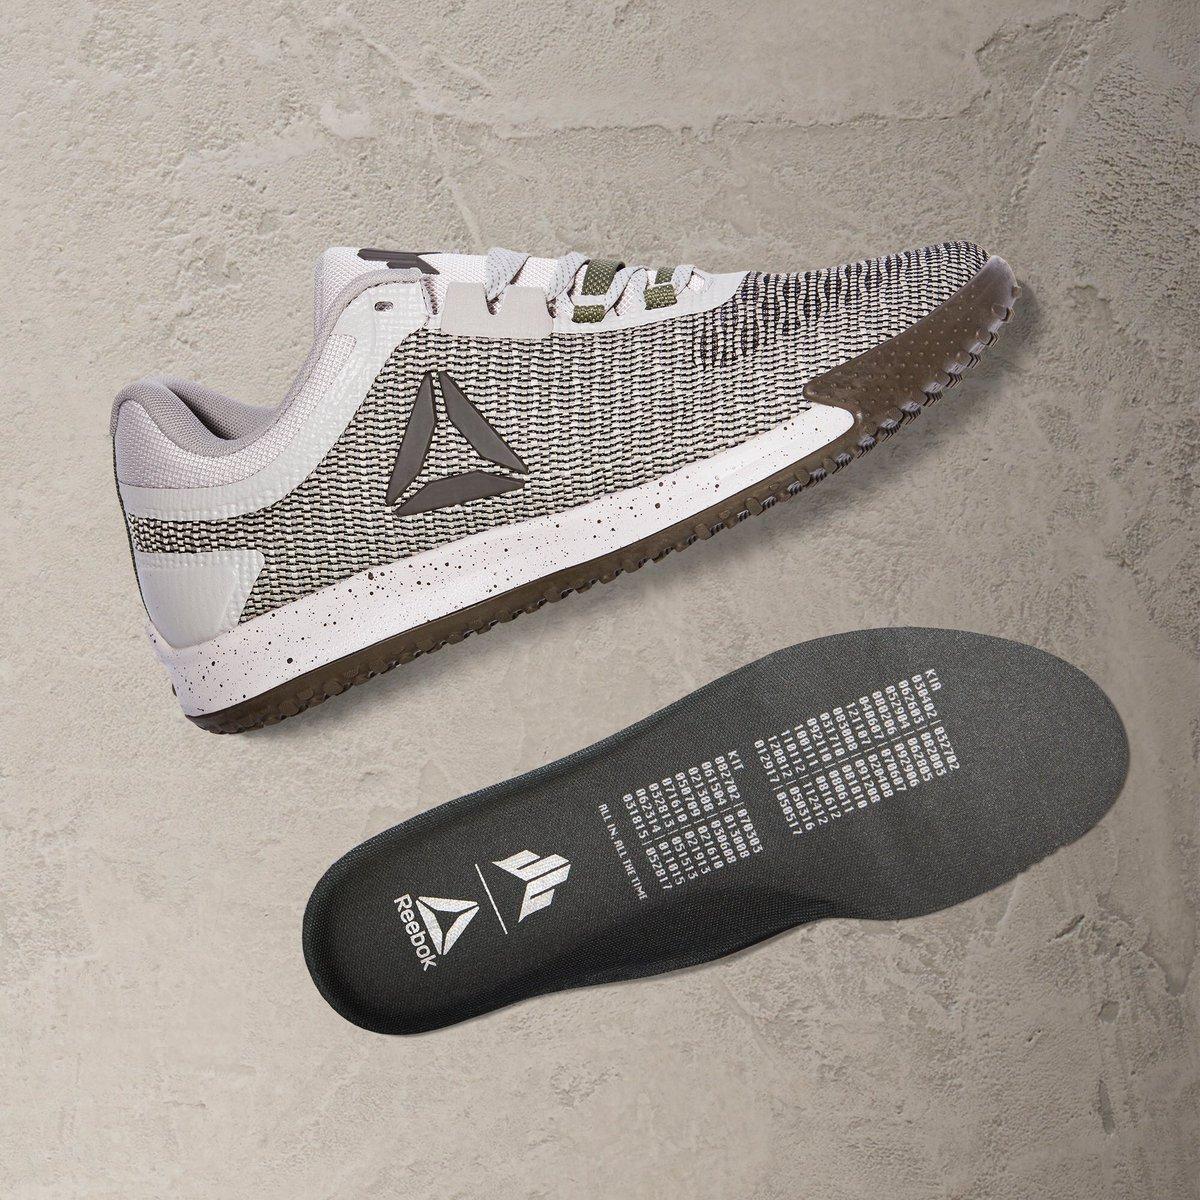 jj watt military shoes, OFF 77%,Best